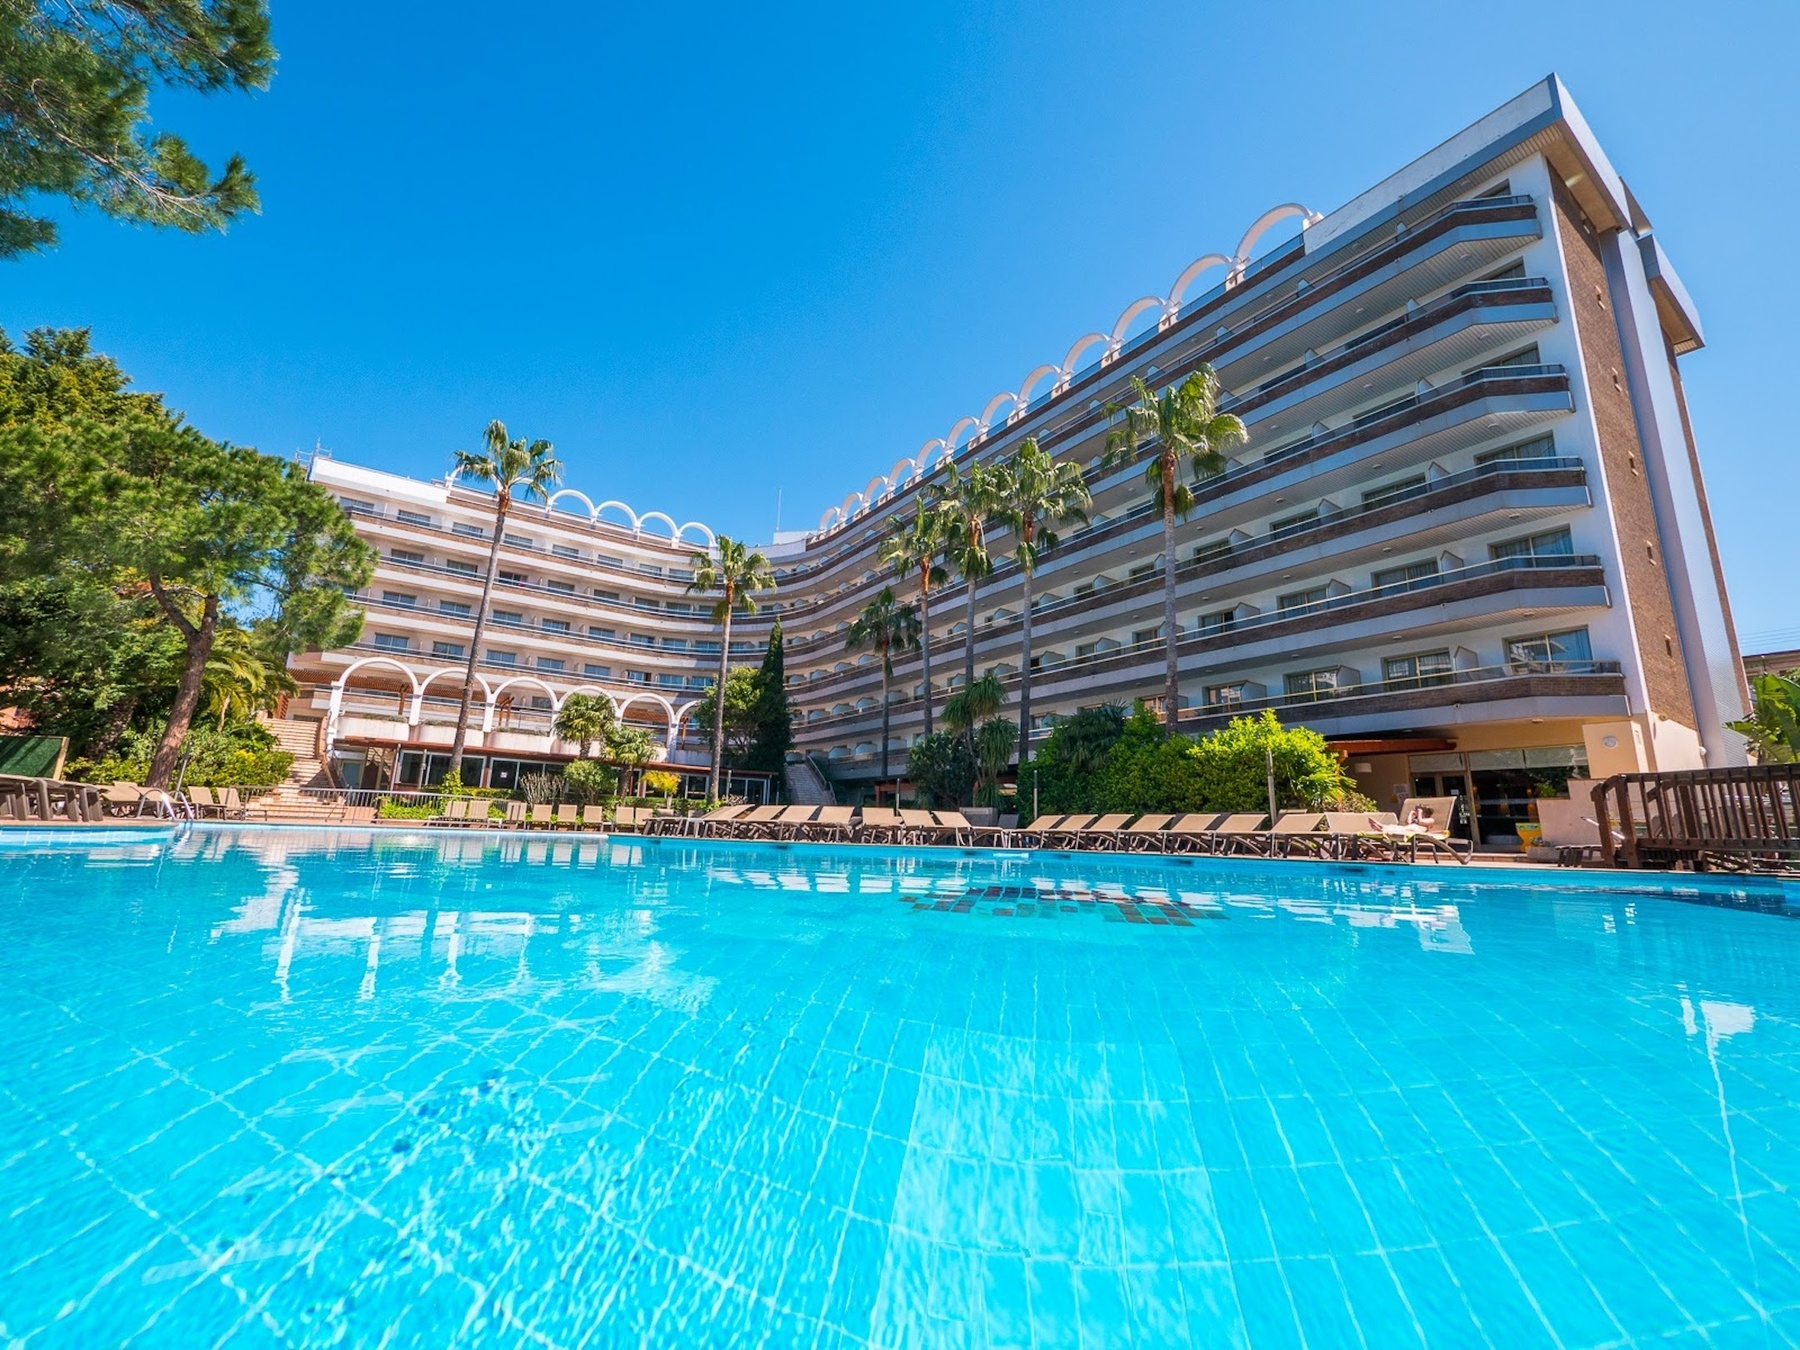 Hotel with family rooms in salou costa dorada - Hotel golden port salou and spa costa dorada ...